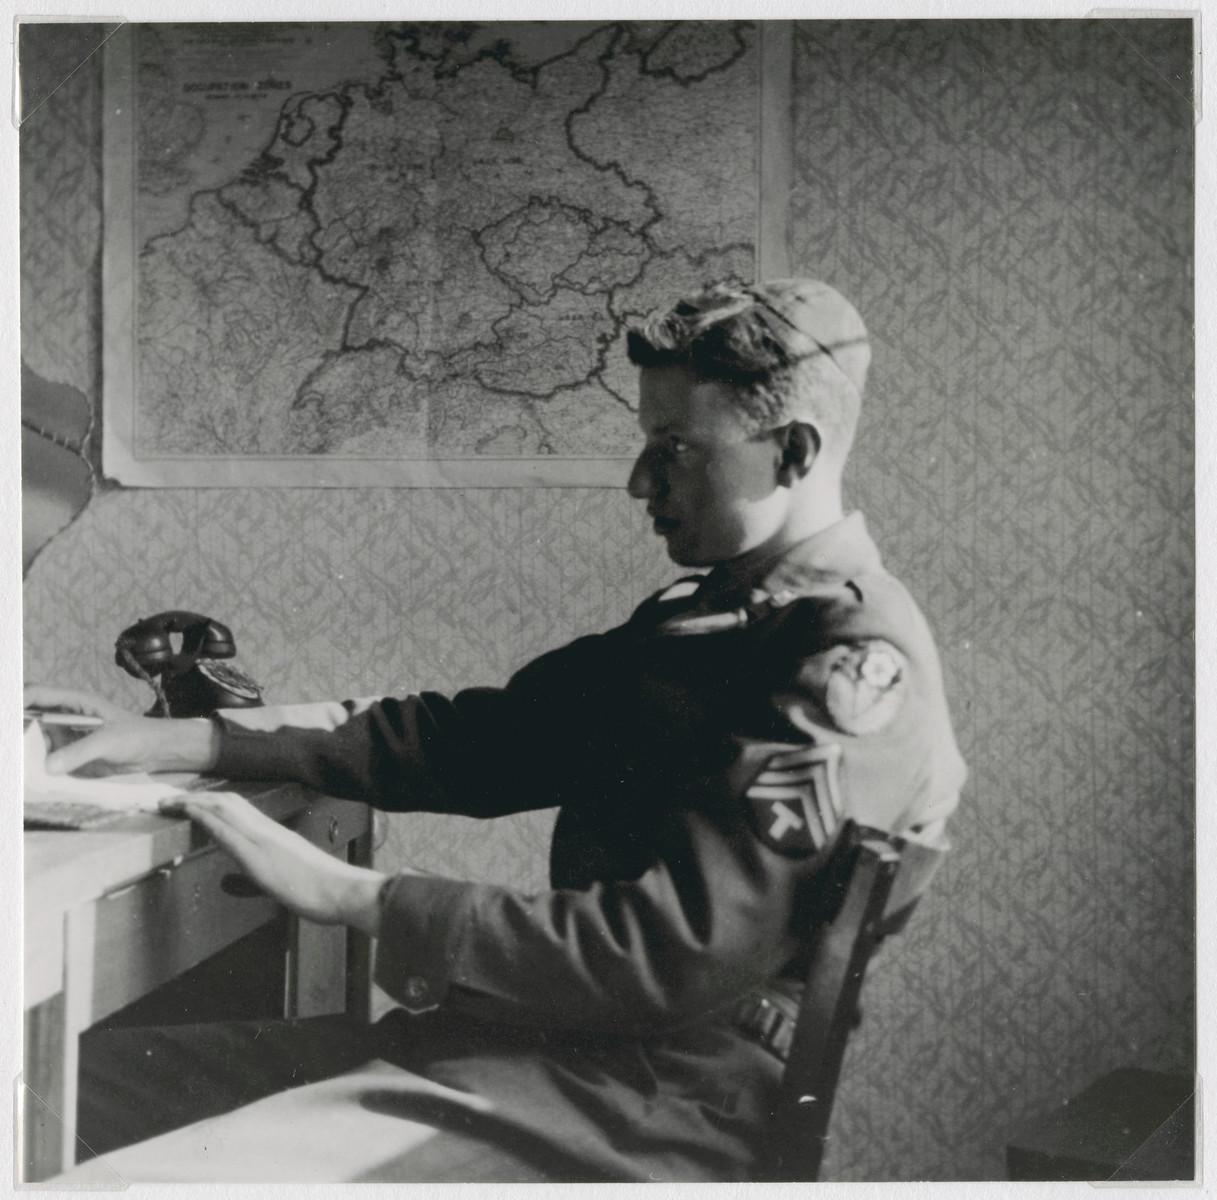 Eliezer Dembitz, a member of the Frankfurt Jewish GI Council, sits at his desk.